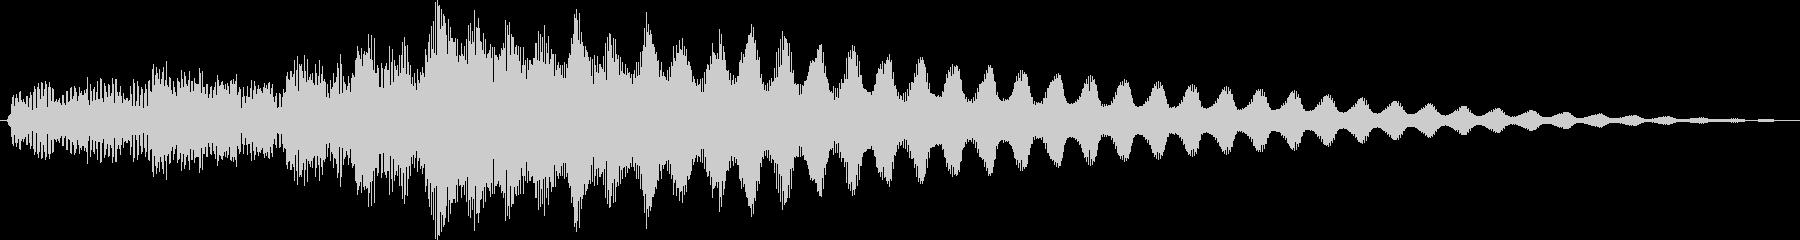 Vibraphone:卑劣なミステ...の未再生の波形